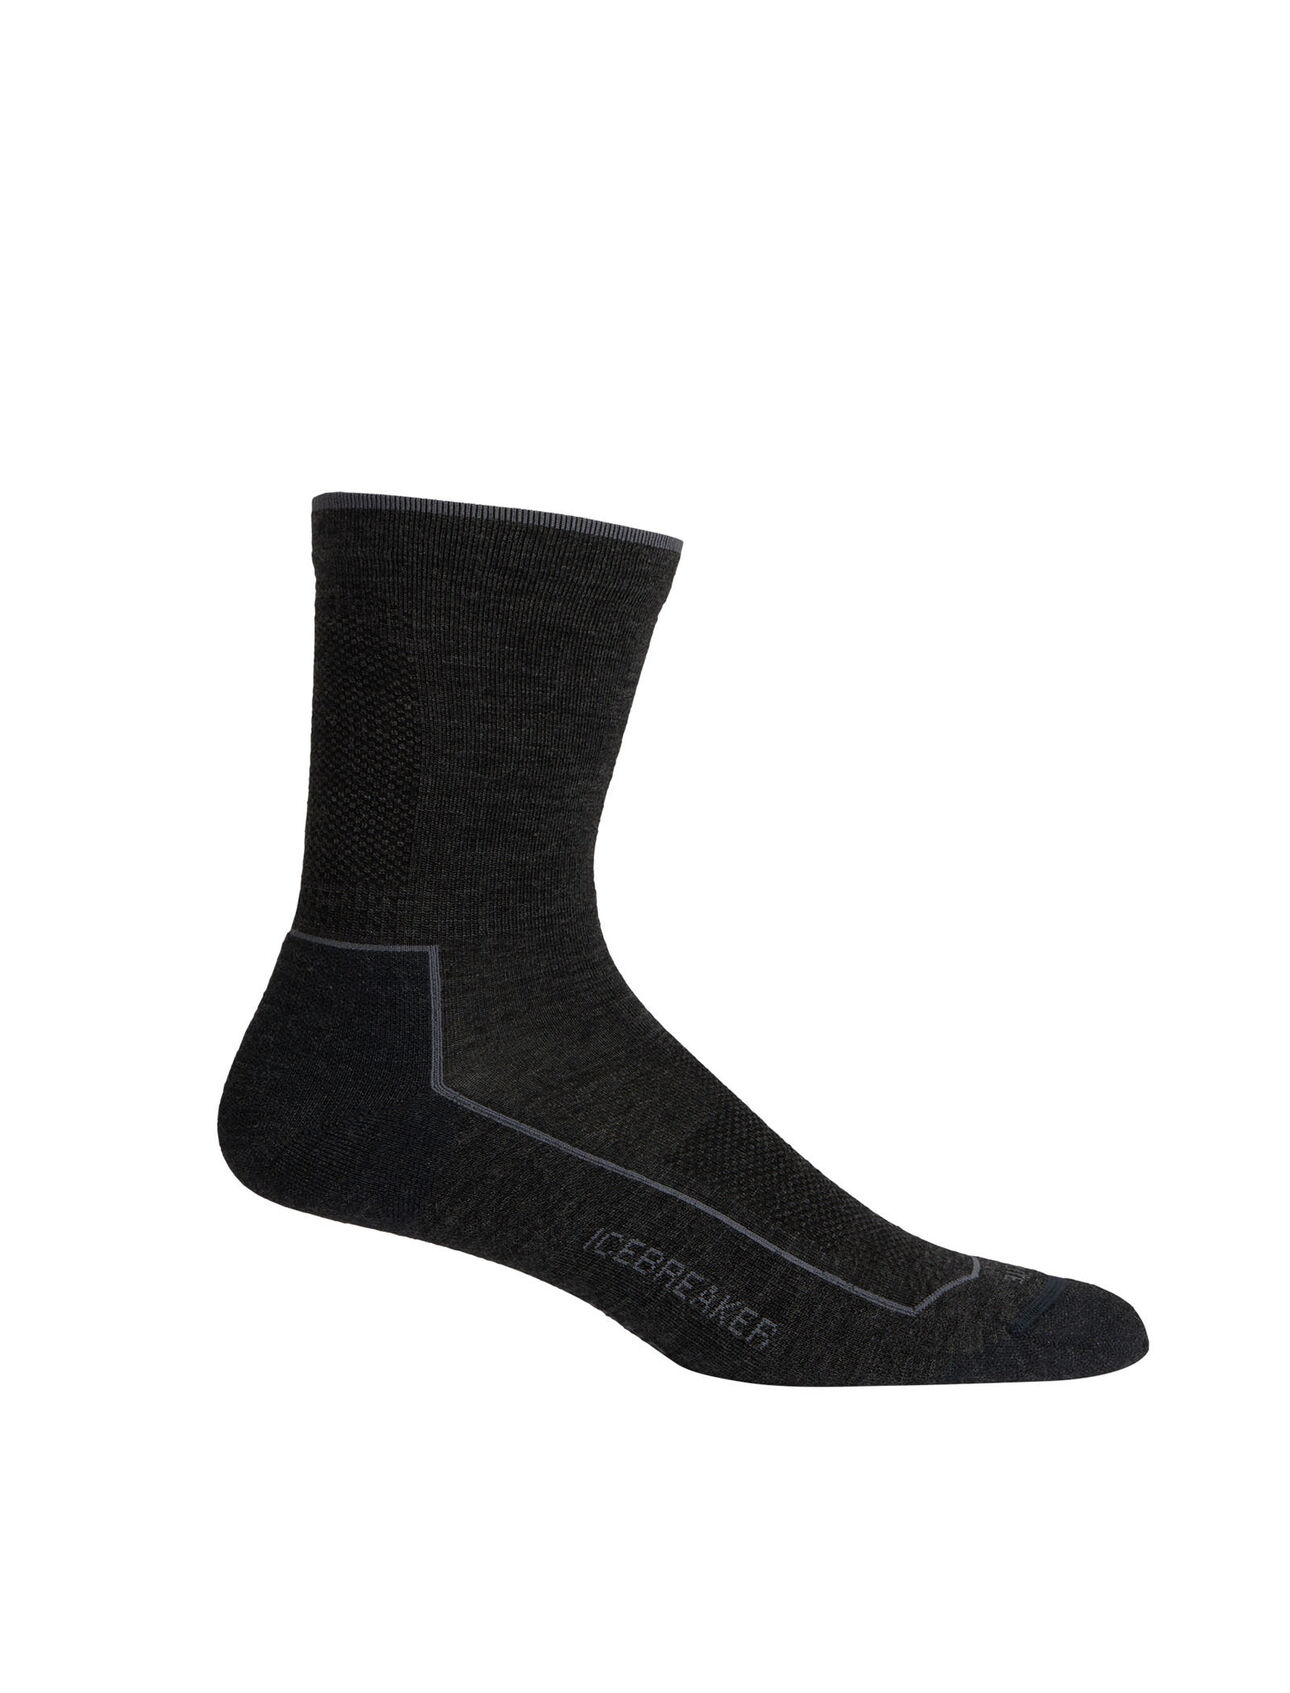 Mens Merino Cool Lite Lifestyle 3q Crew Socks Icebreaker